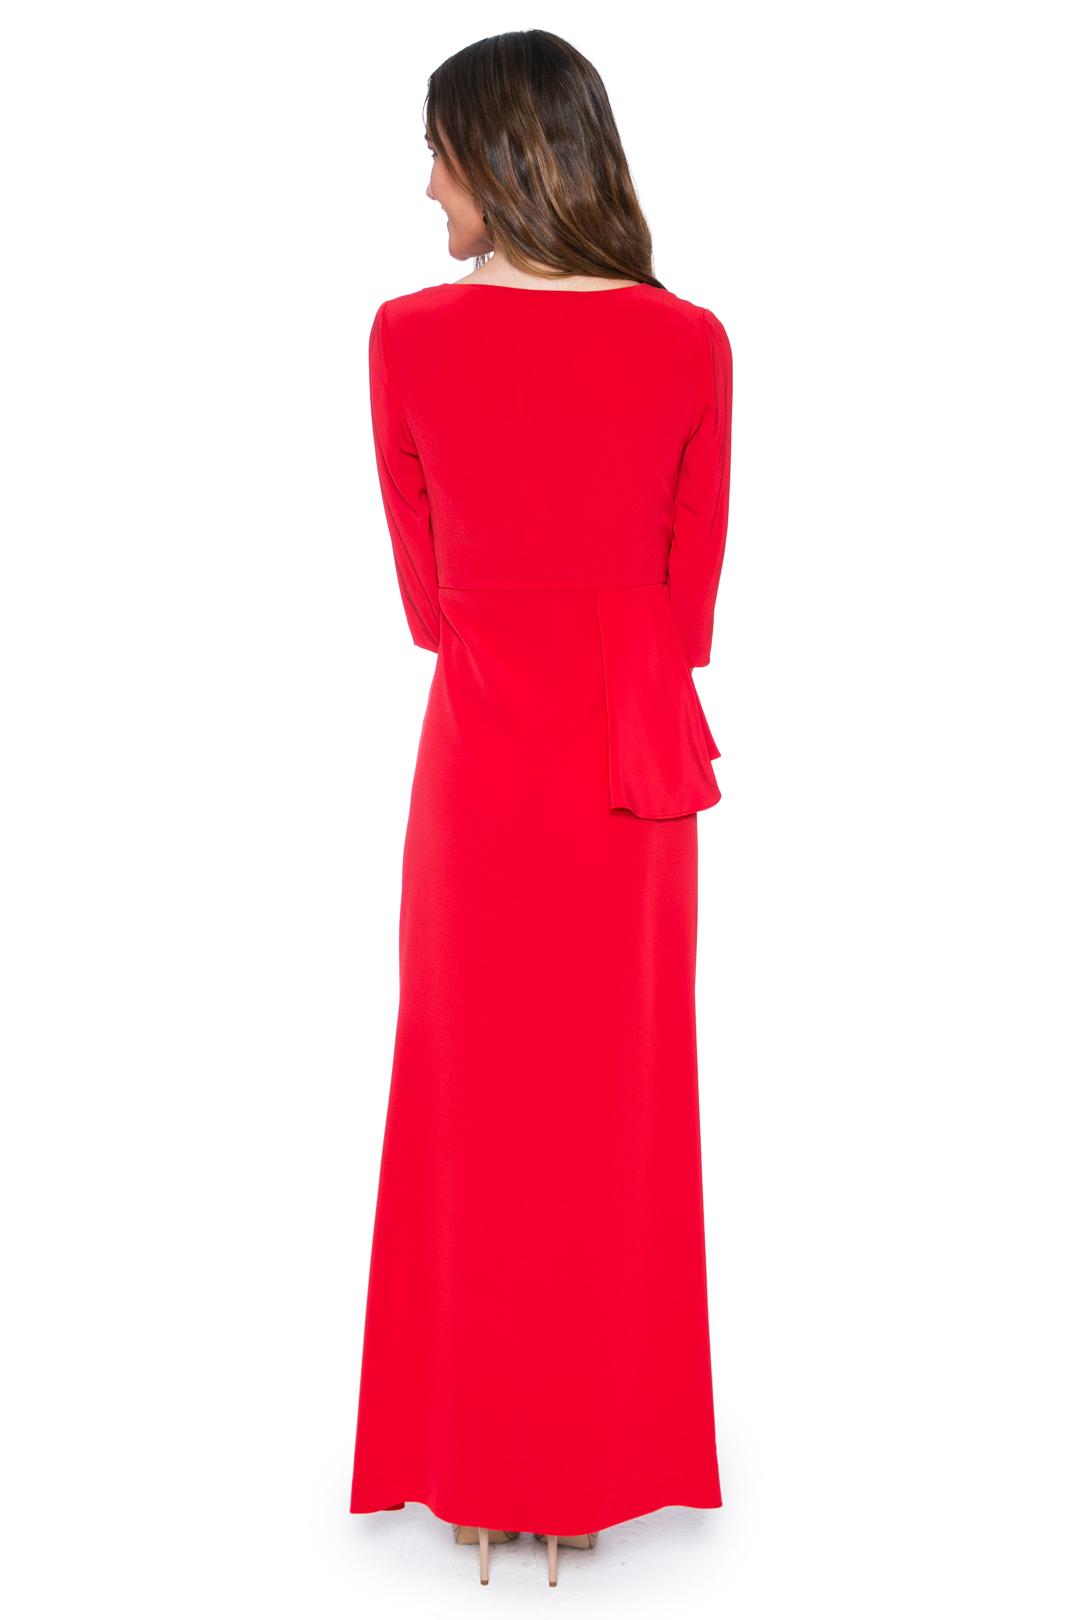 left - Vestido Elie Red